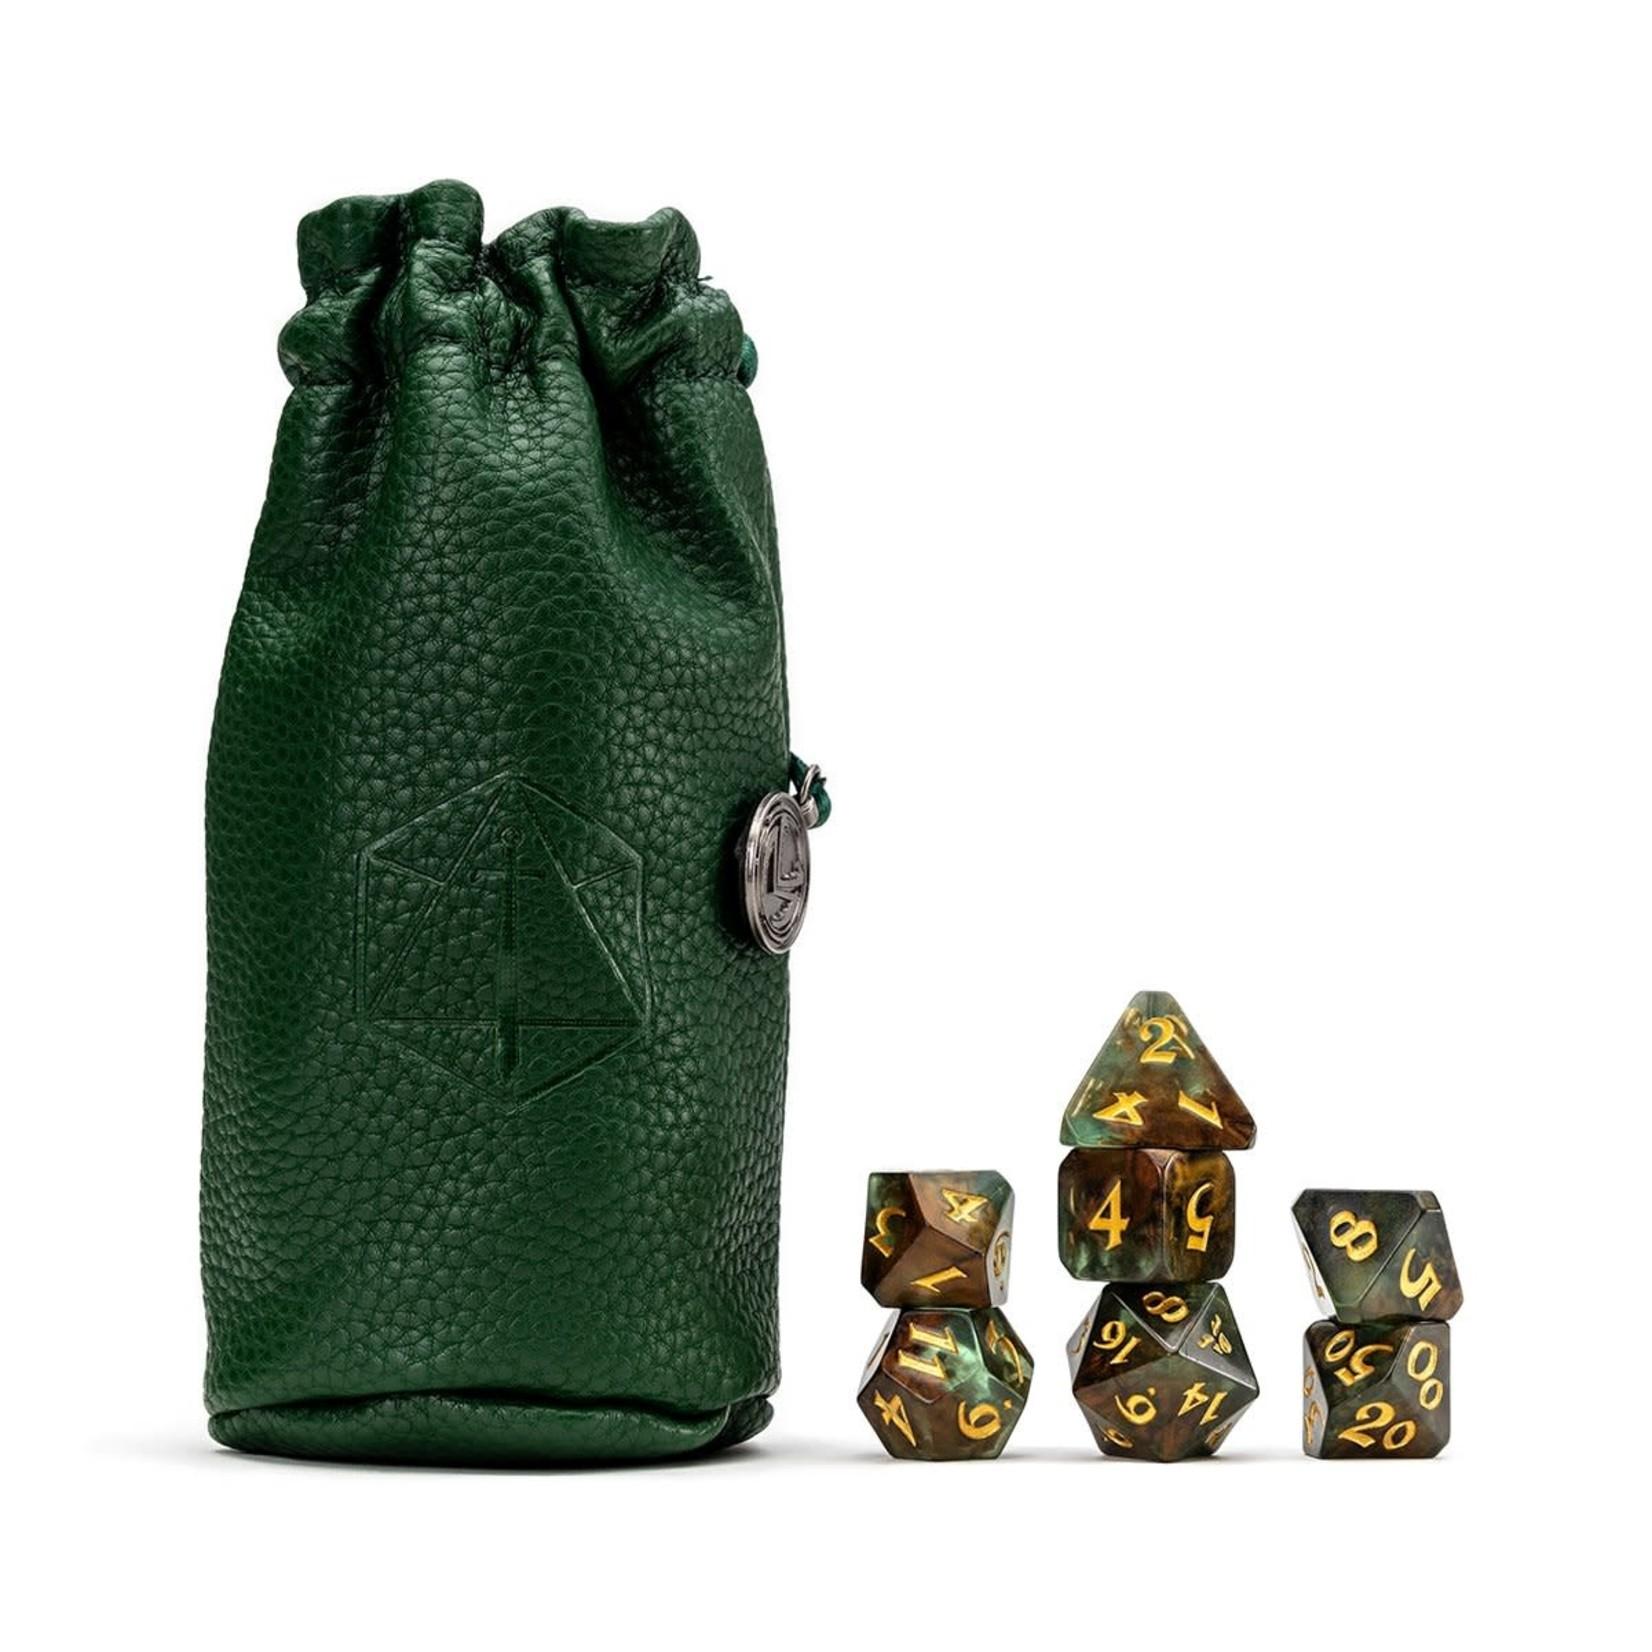 Darrington Press Vox Machina Dice Set: Keyleth (Green)